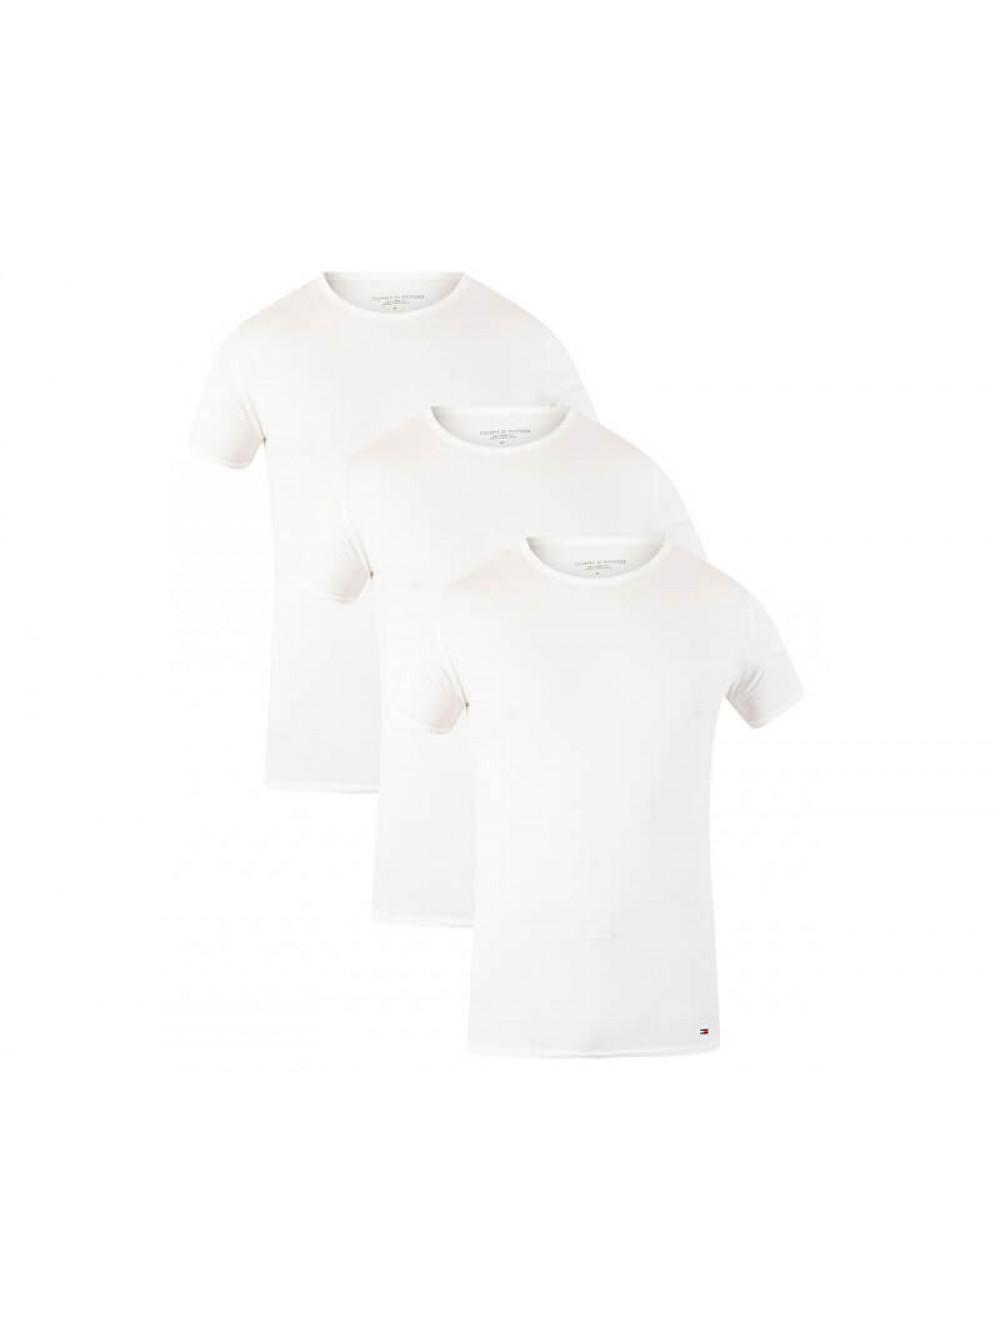 Pánske tričko Tommy Hilfiger C-Neck Tee SS biele 3-pack